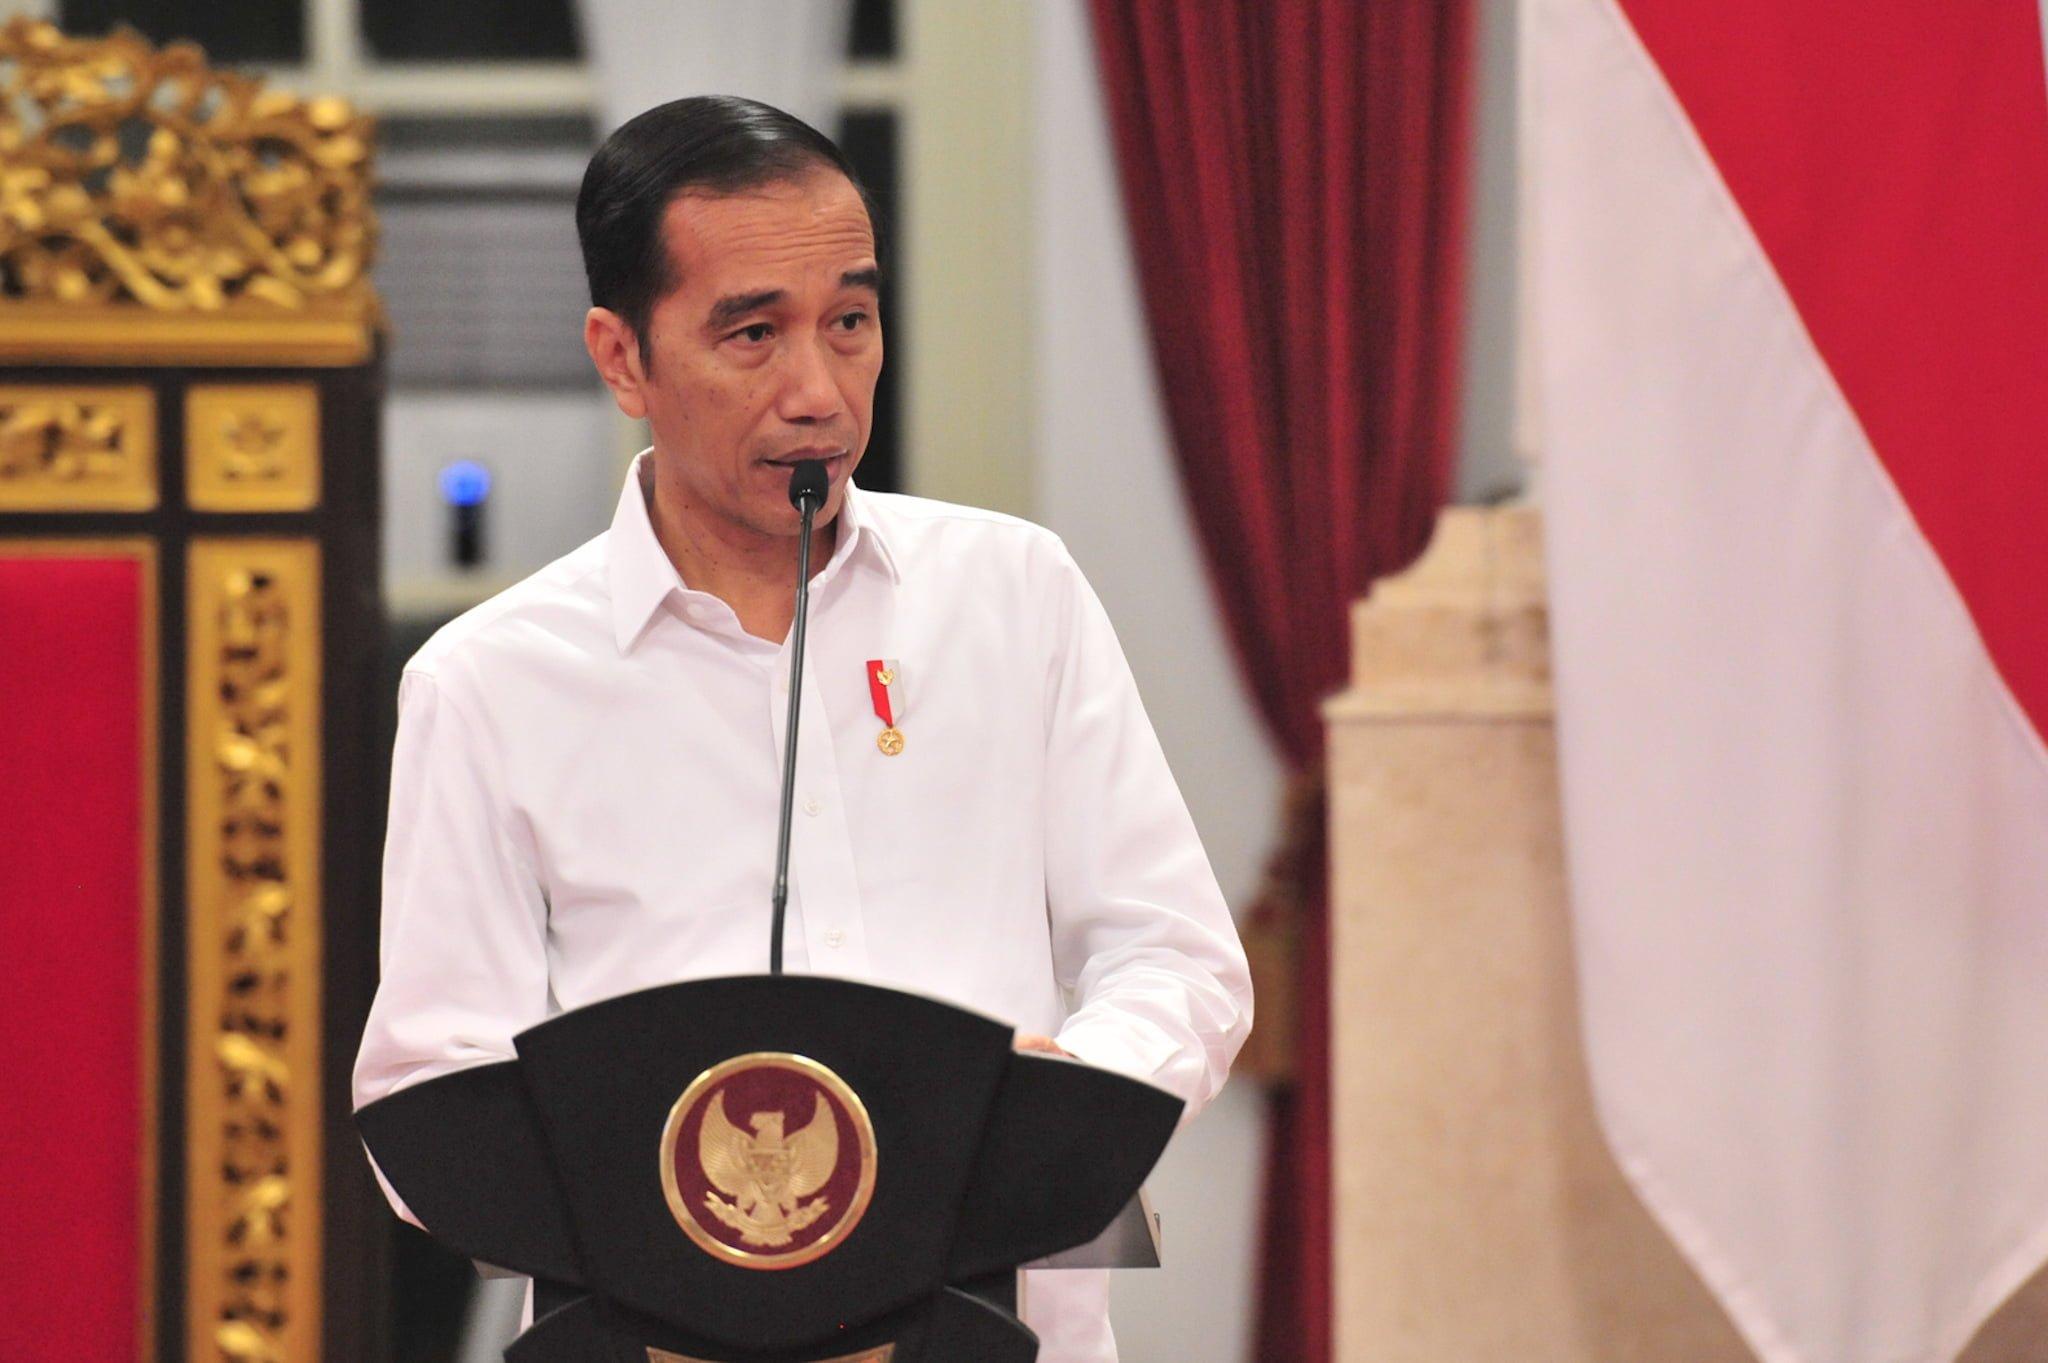 Soal Natuna, Presiden Jokowi Tegaskan Tidak Ada Tawar-Menawar Soal Kedaulatan 111